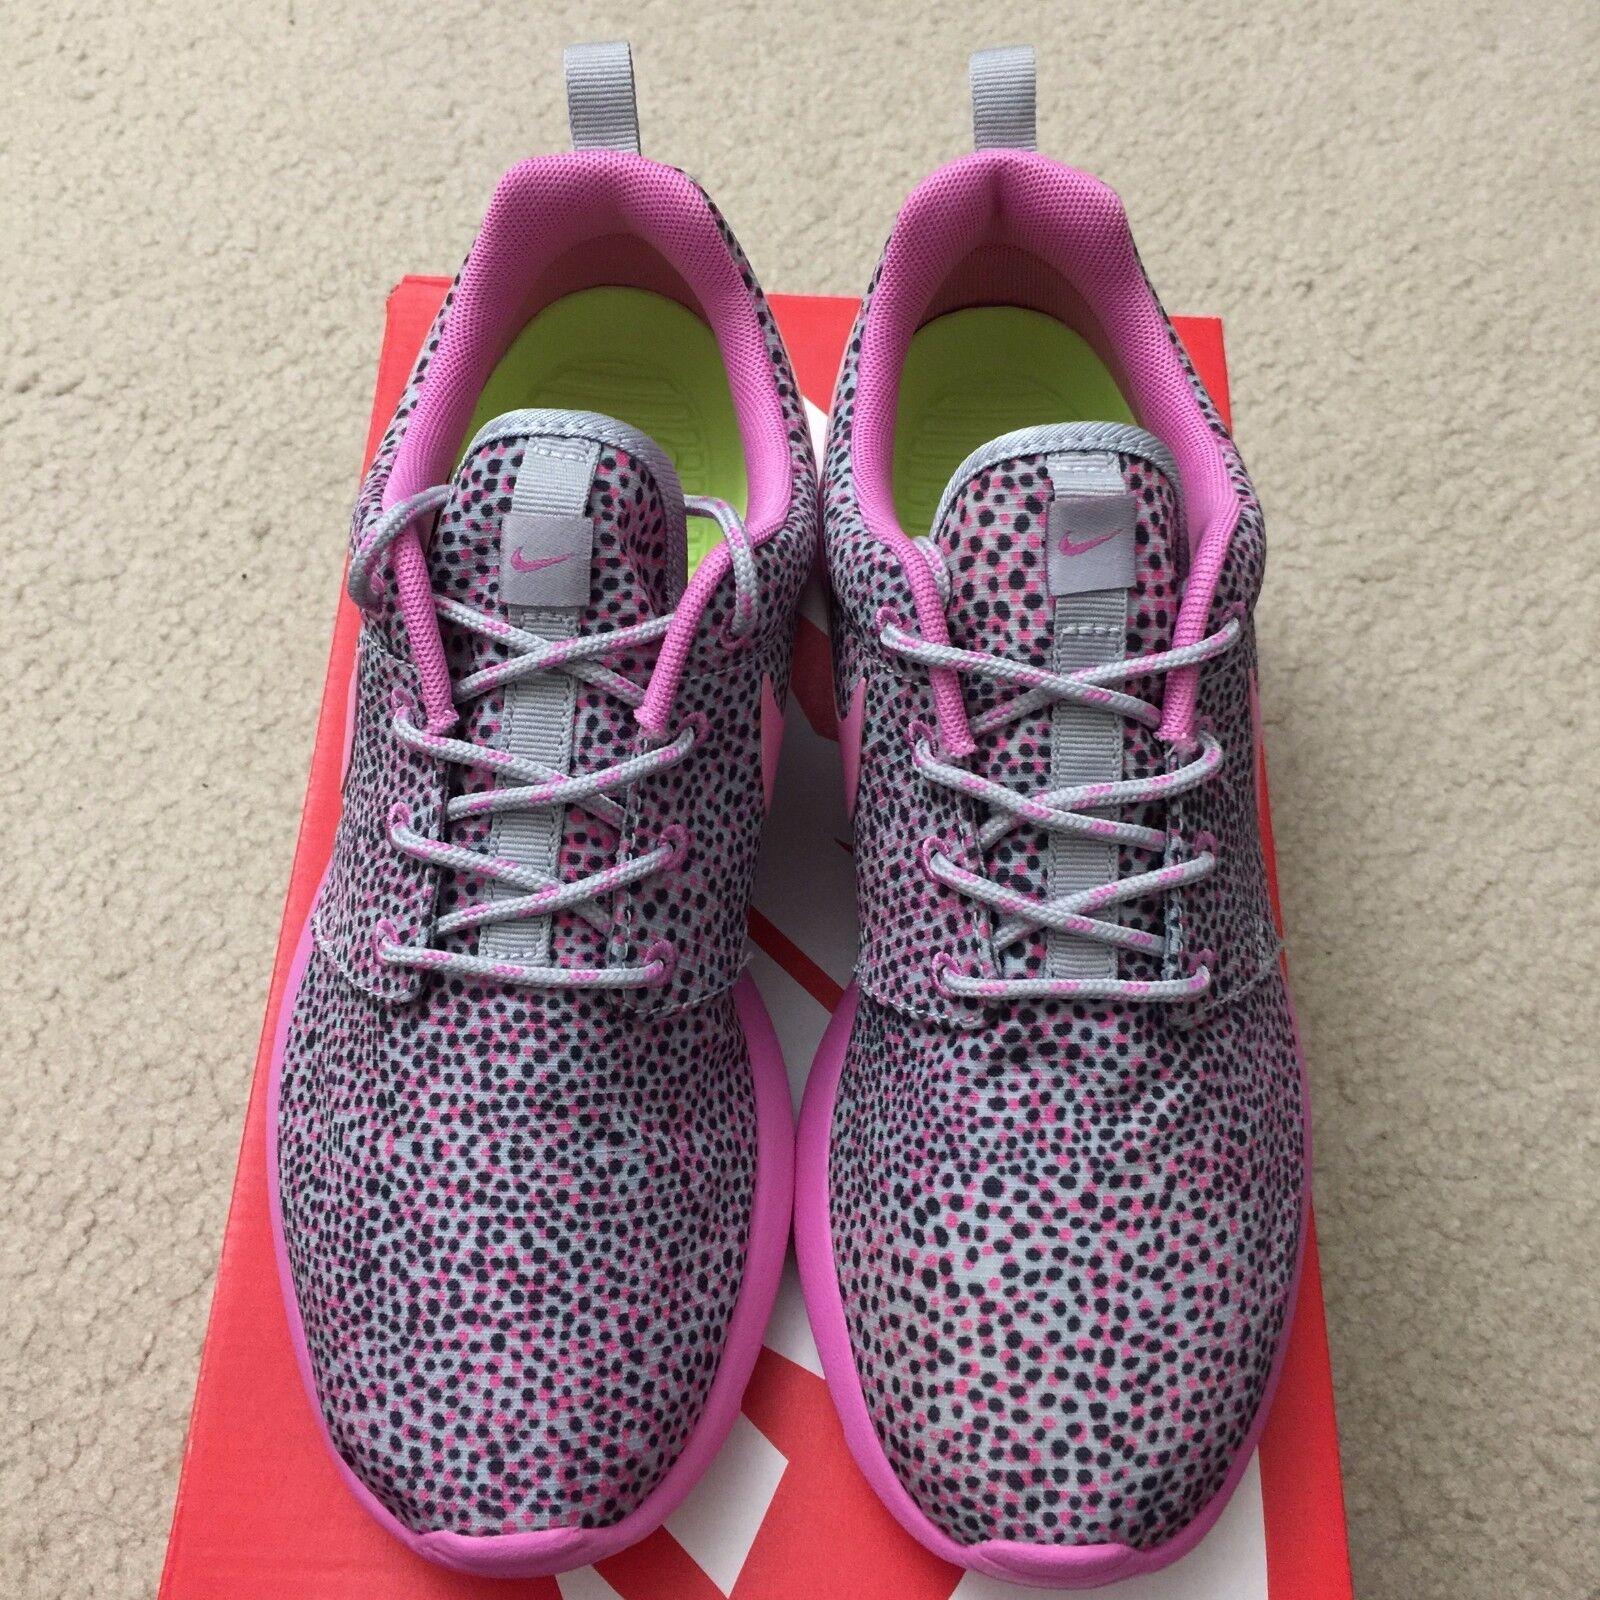 Nike Roshe Run Polka Dot Print